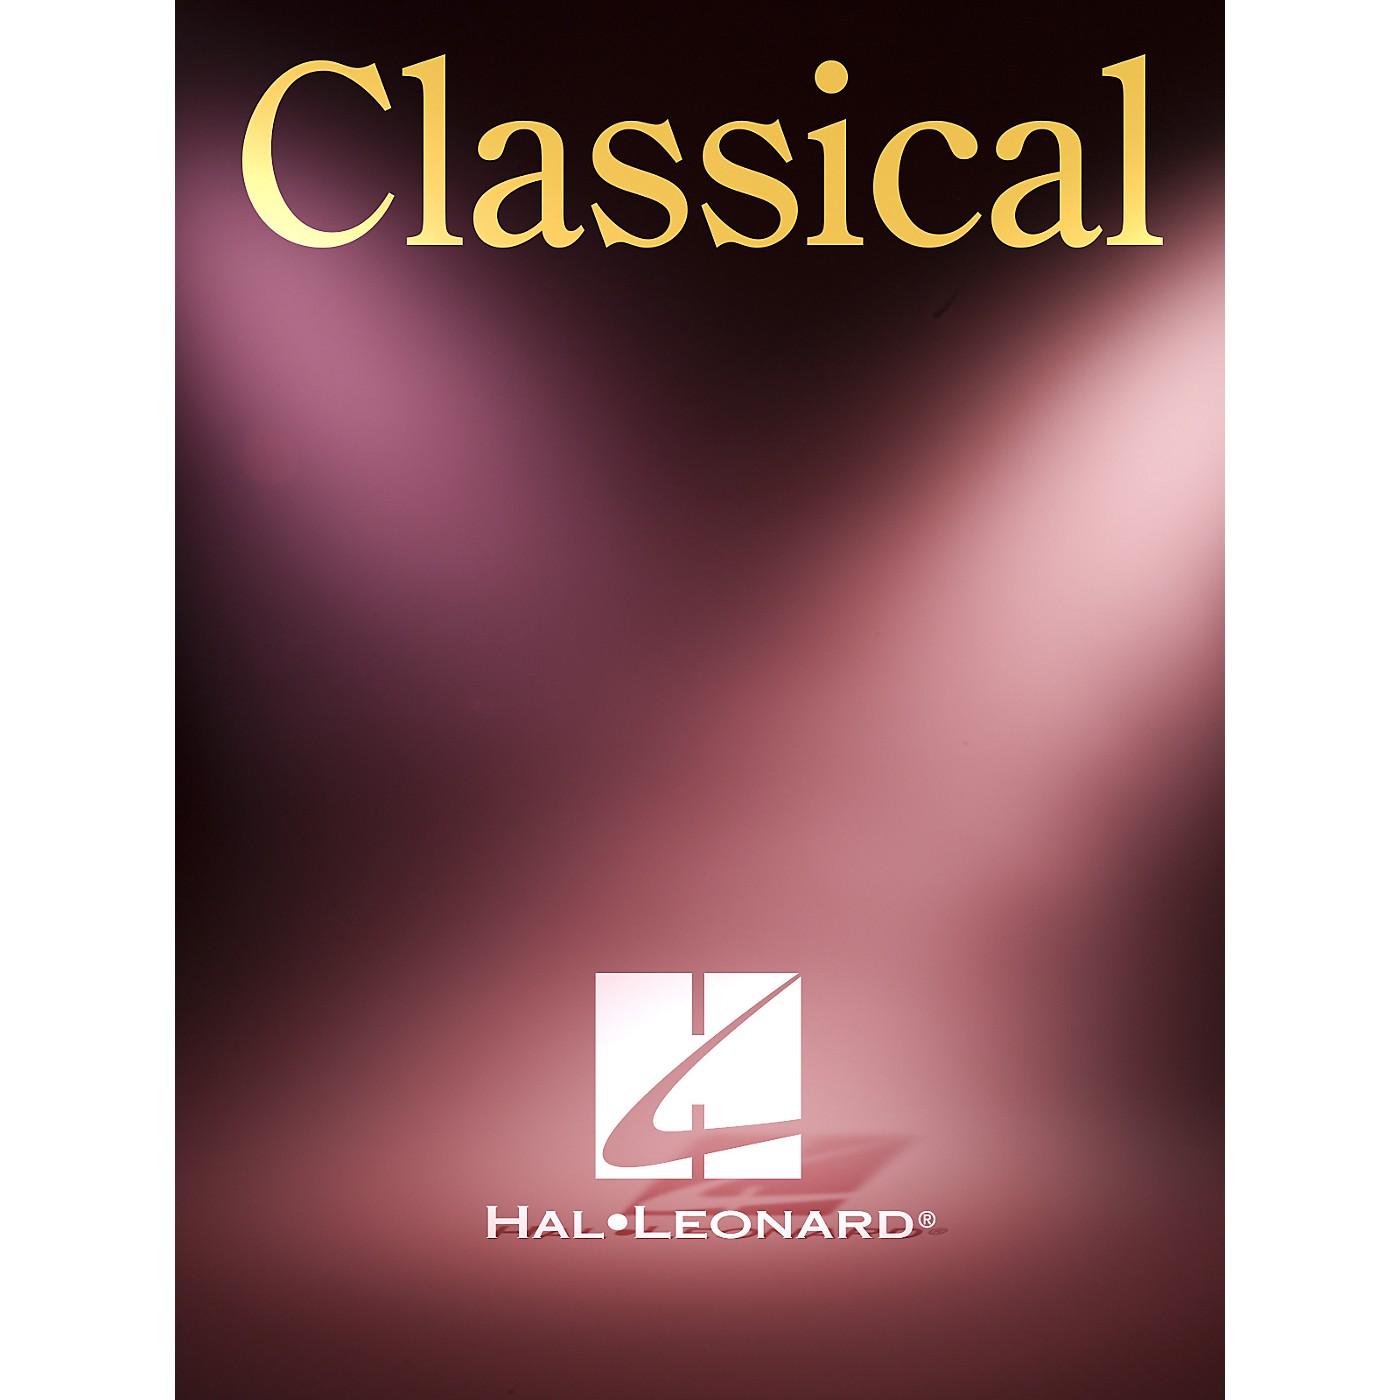 Hal Leonard Trio Concertante Op. 103 N. 2 Re Vn Vla Chit Suvini Zerboni Series thumbnail